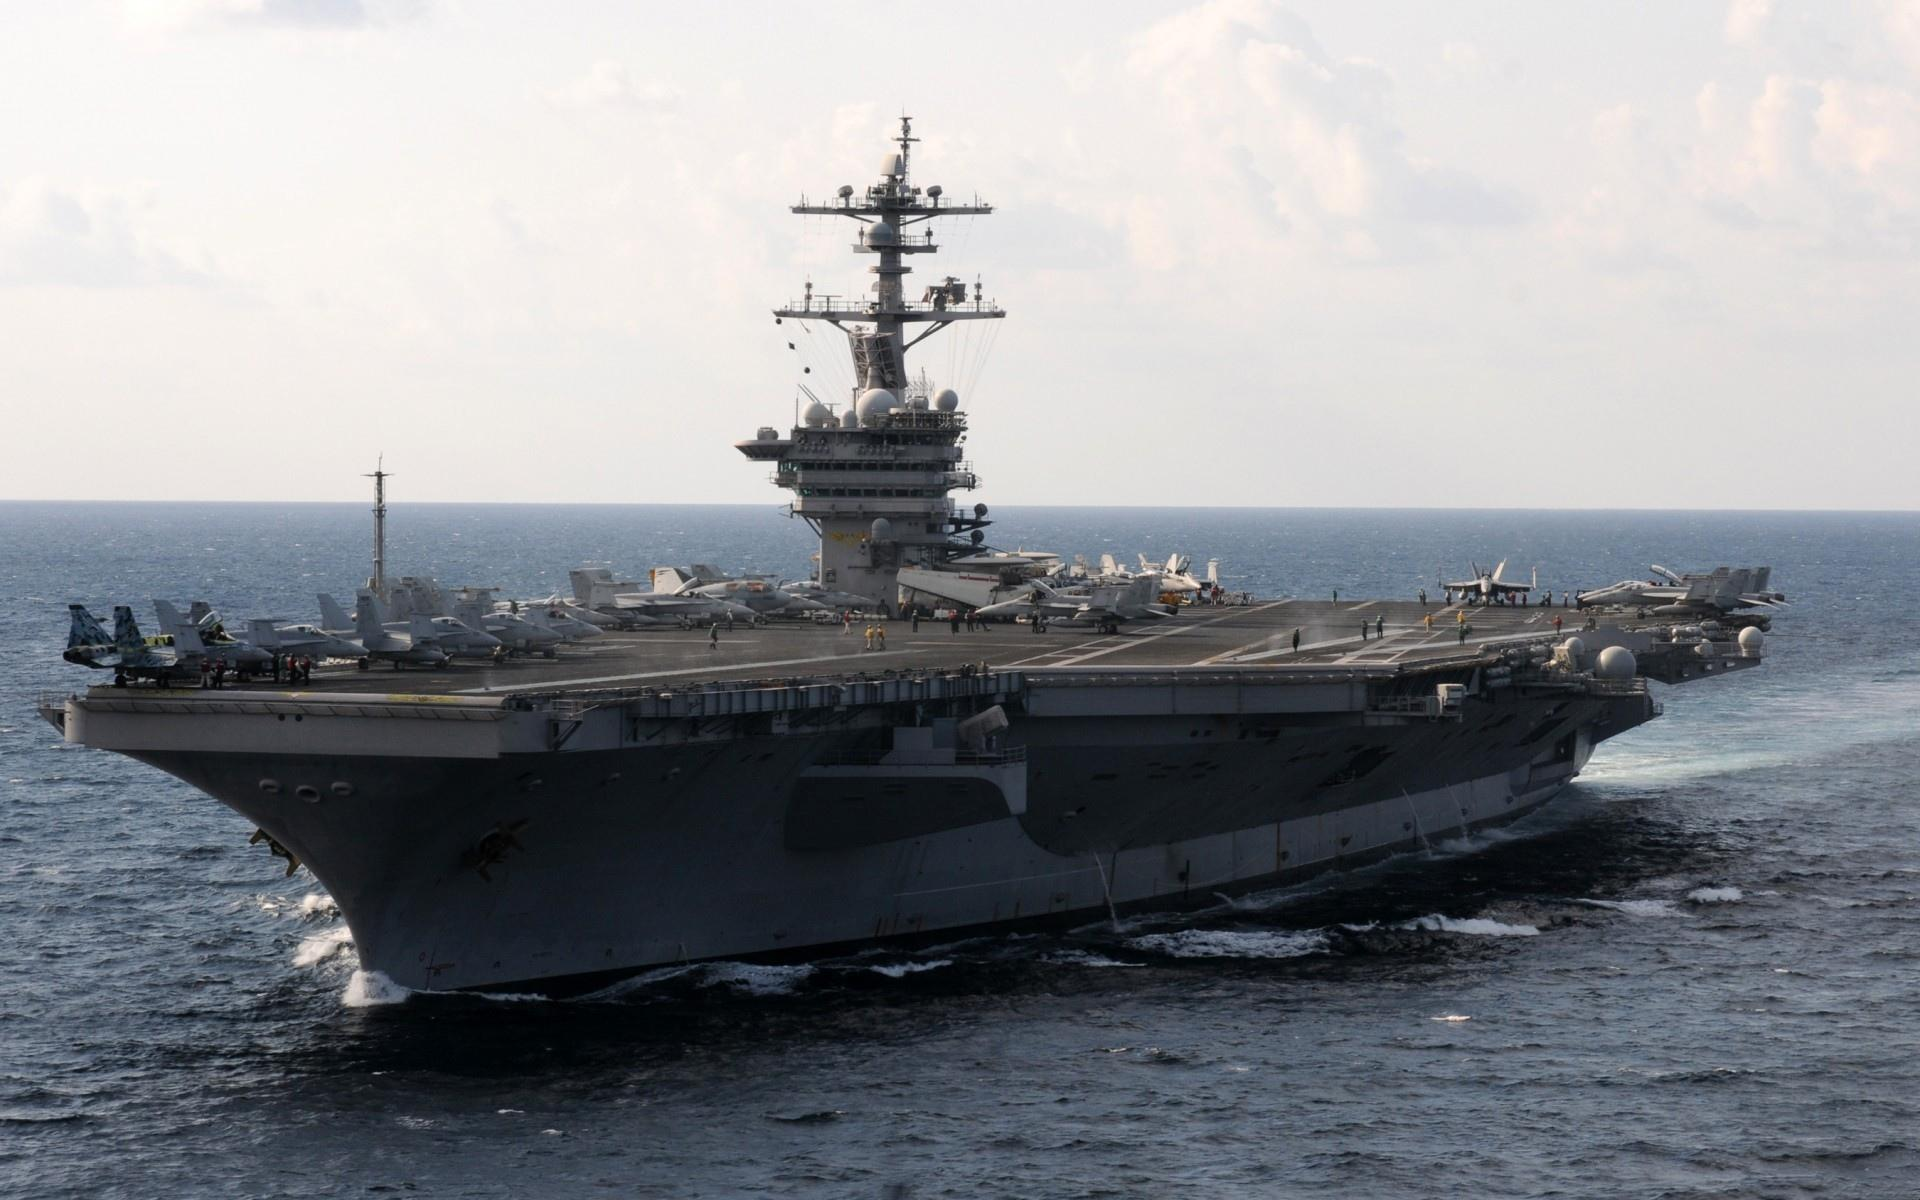 USS Carl Vinson (CVN-70) wallpapers HD quality